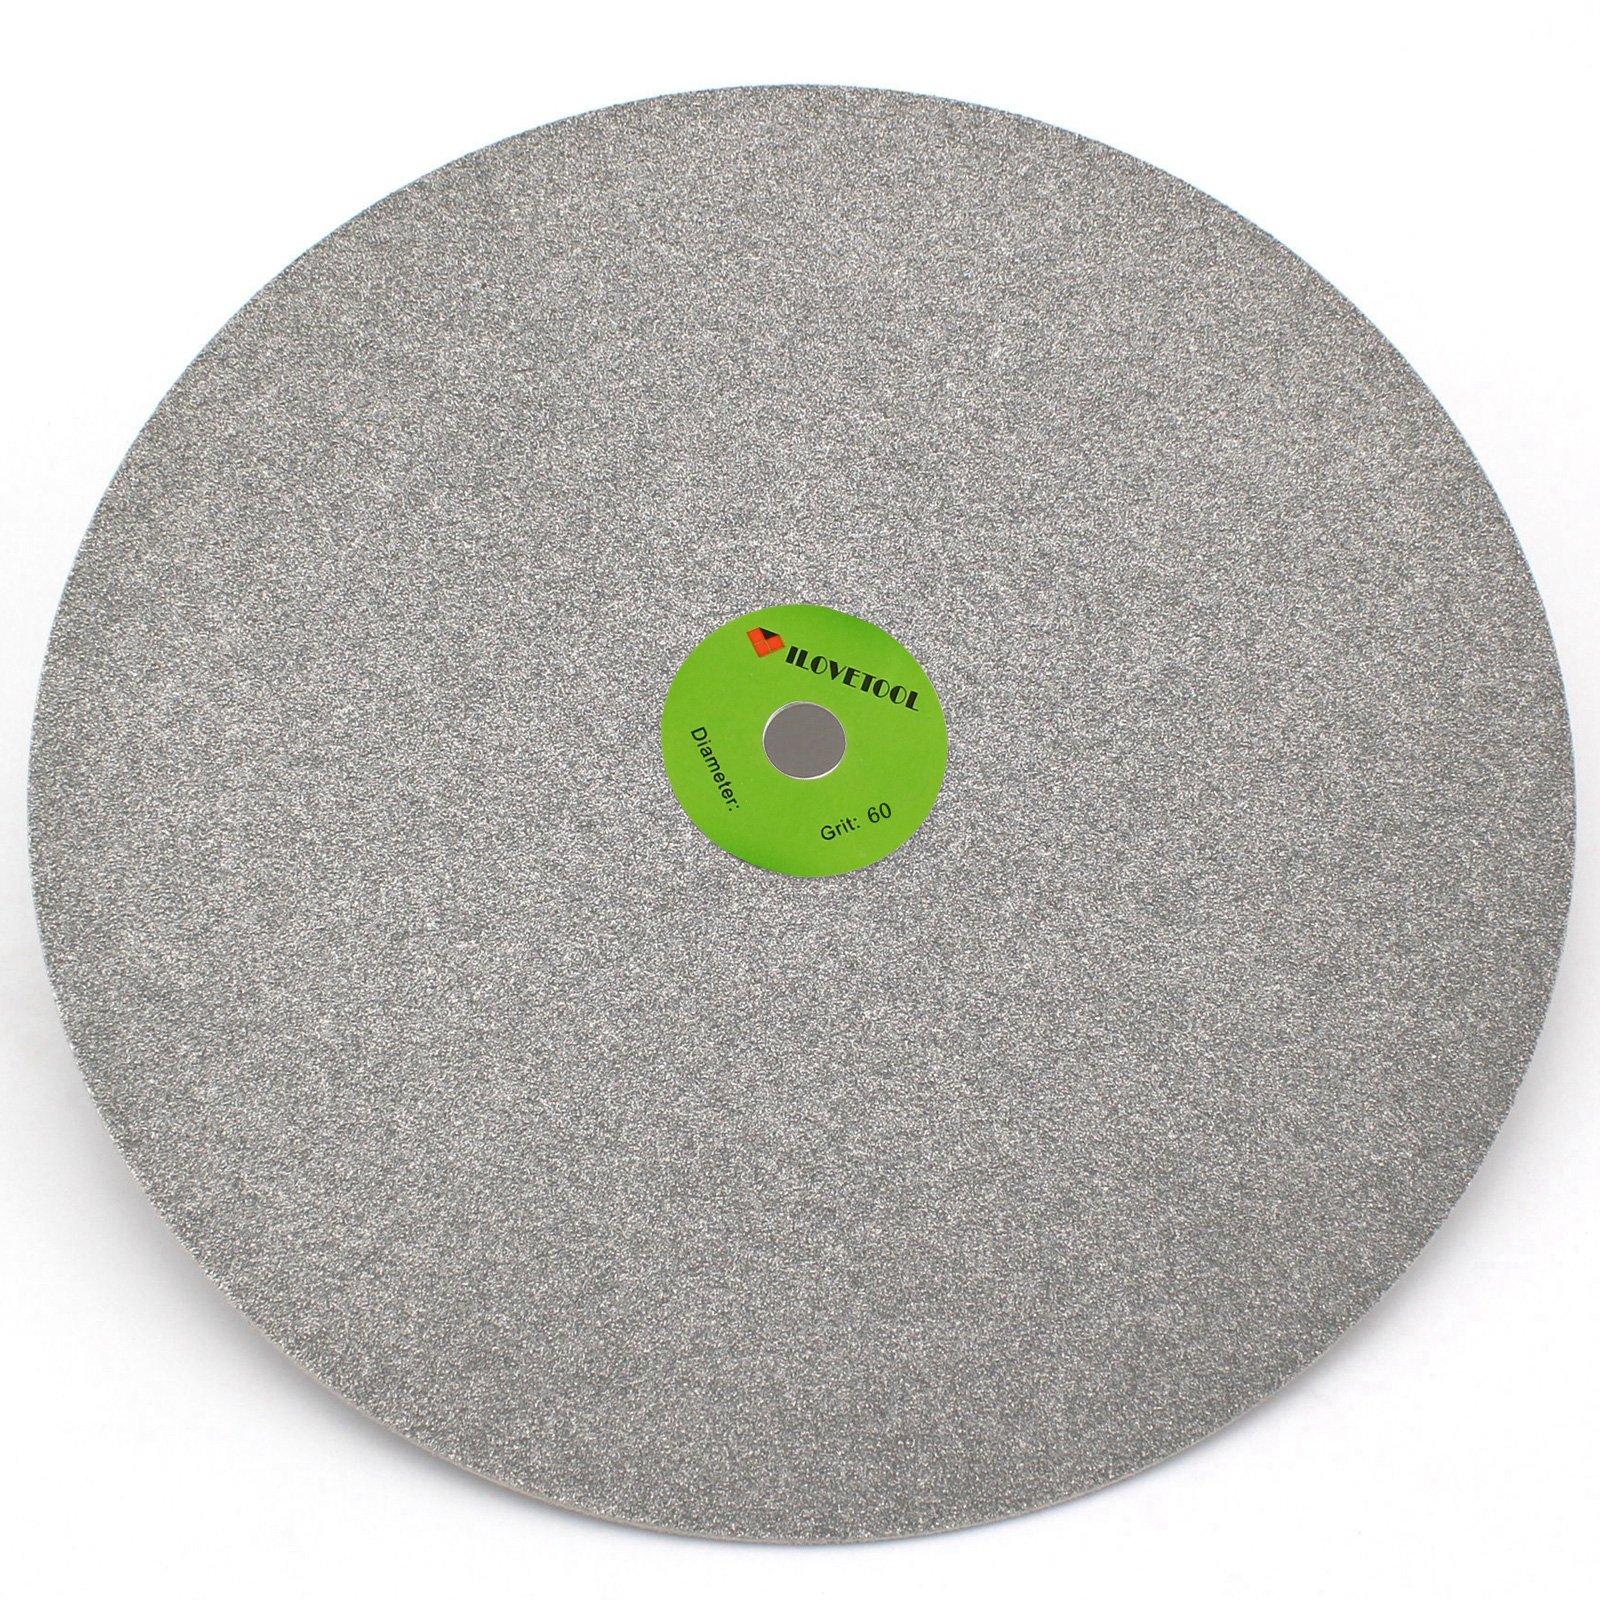 ILOVETOOL 24 inch 60 Grit Diamond Coated Flat Lap Disk Wheel